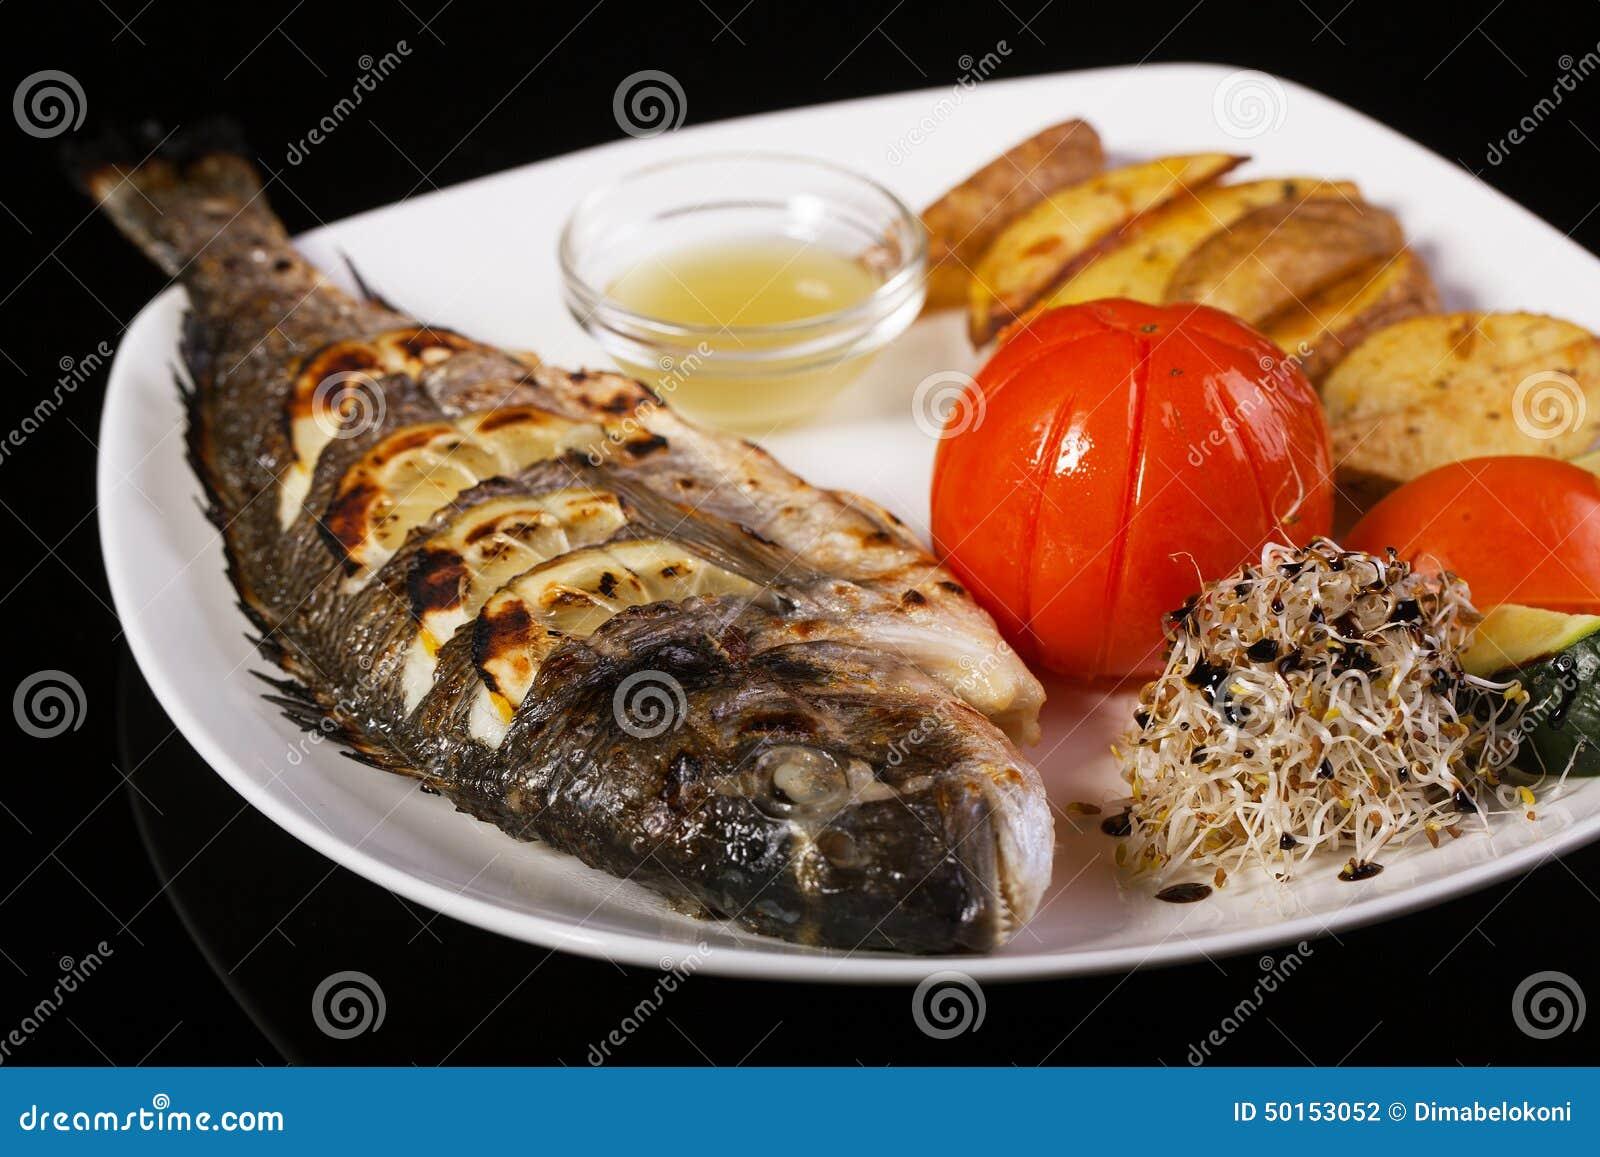 Dorade grill e de poissons sur le barbecue photo stock image du nourriture pice 50153052 - Accompagnement poisson grille barbecue ...